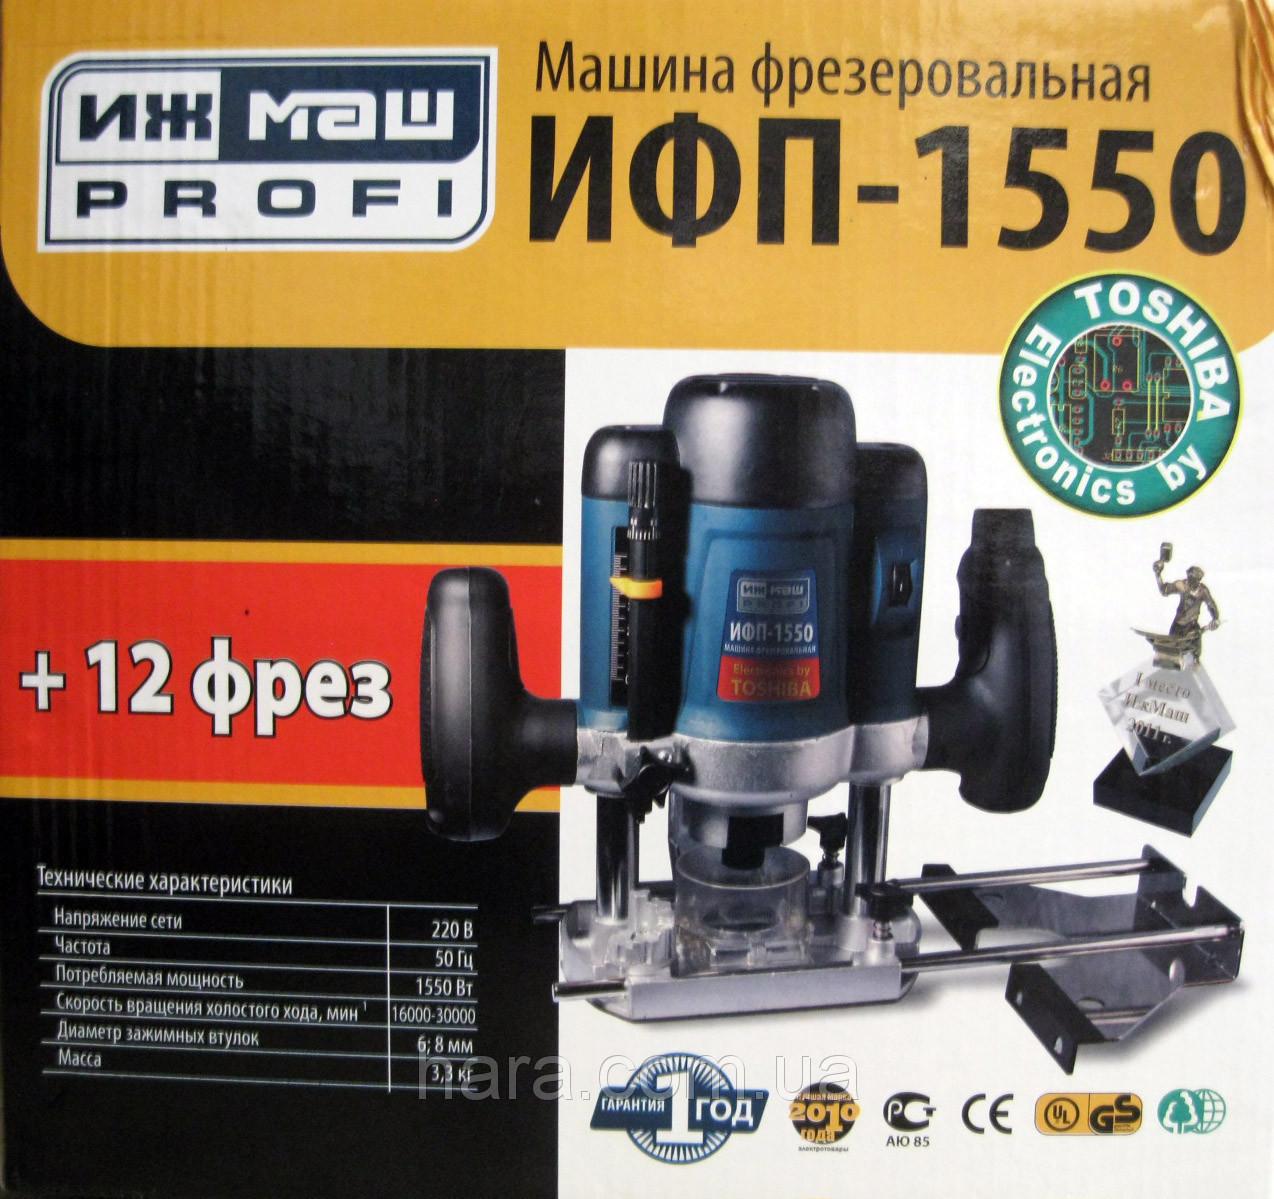 0b7a615d99ba Купить Фрезер Ижмаш Profi ИФП-1550 с набором фрез оптом и в розницу ...